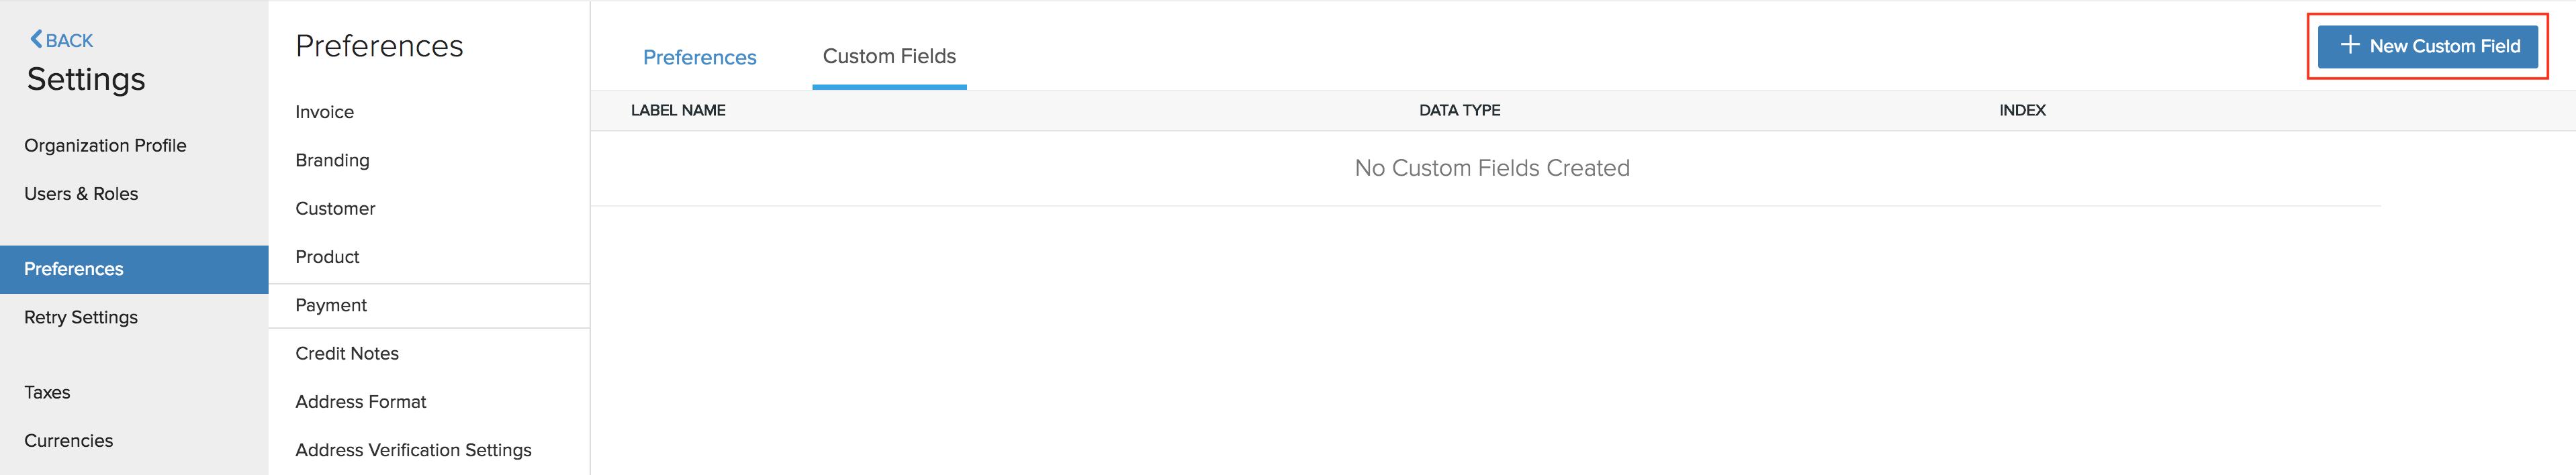 Payment Custom Field 1